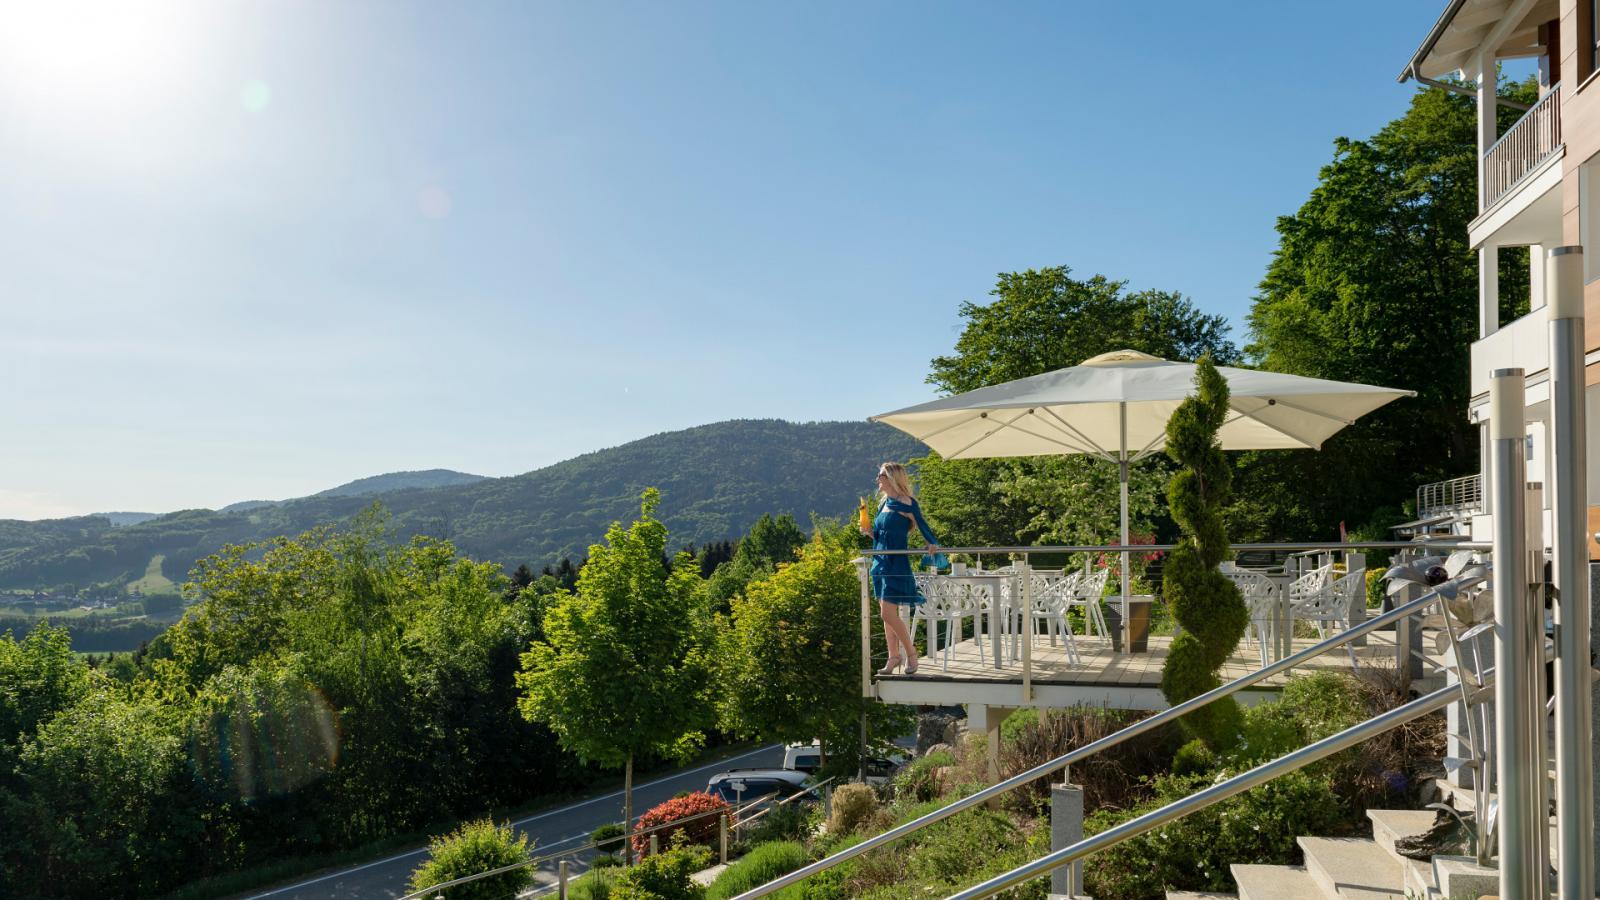 Kinesiologie: Foto vom Wellnesshotel Thula Wellness-Hotel Bayerischer Wald   Wellness Bayern